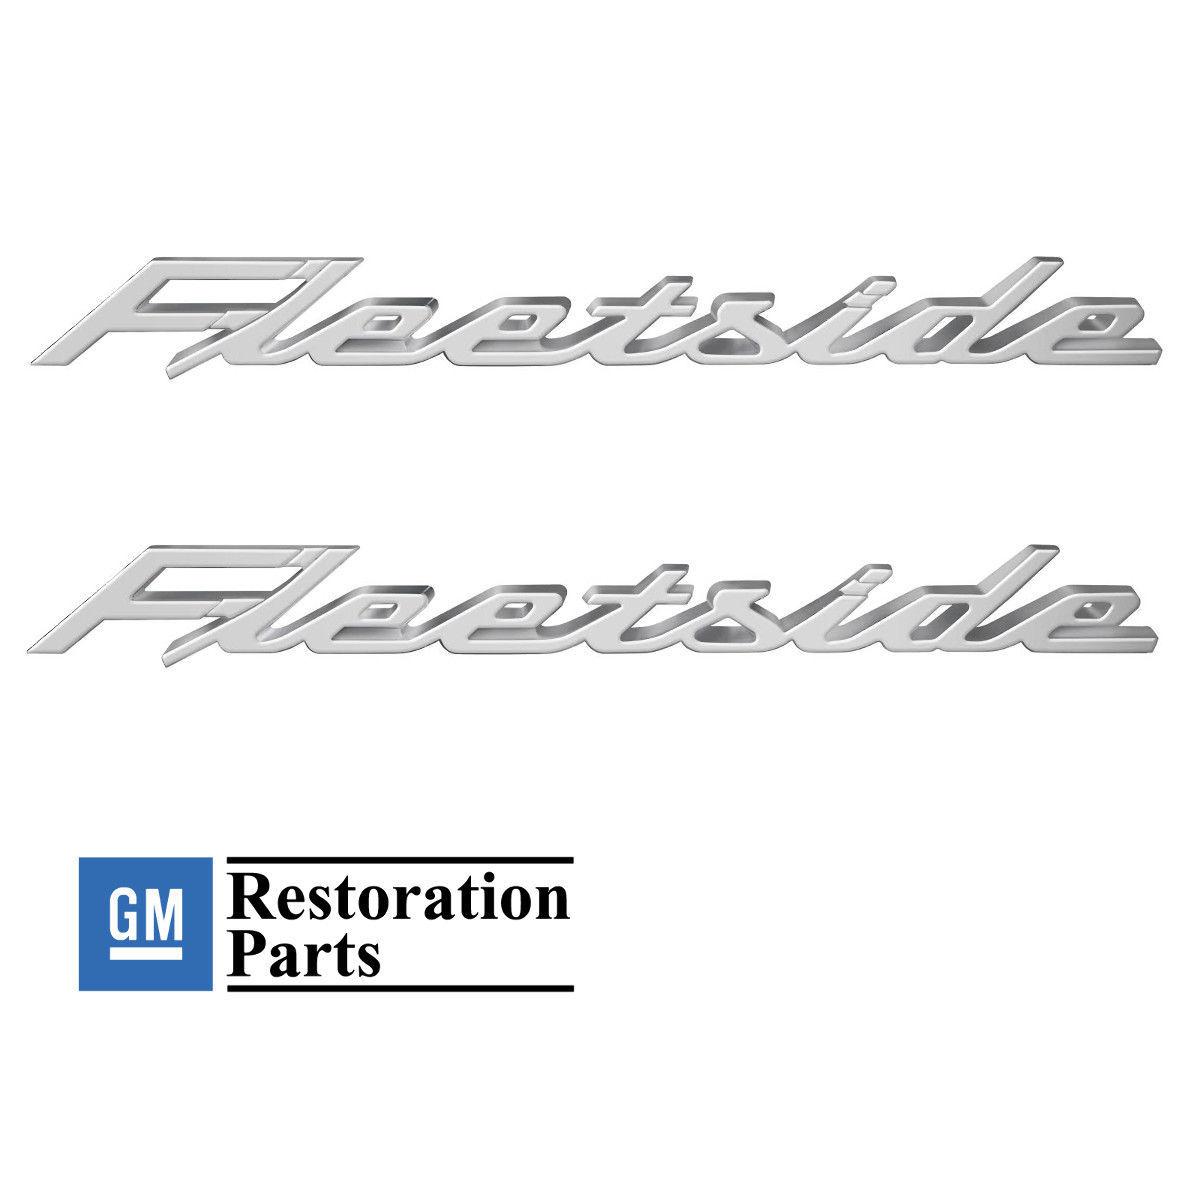 (2) 1958-1959 Chevy Fleetside Rear Bed Script Chrome